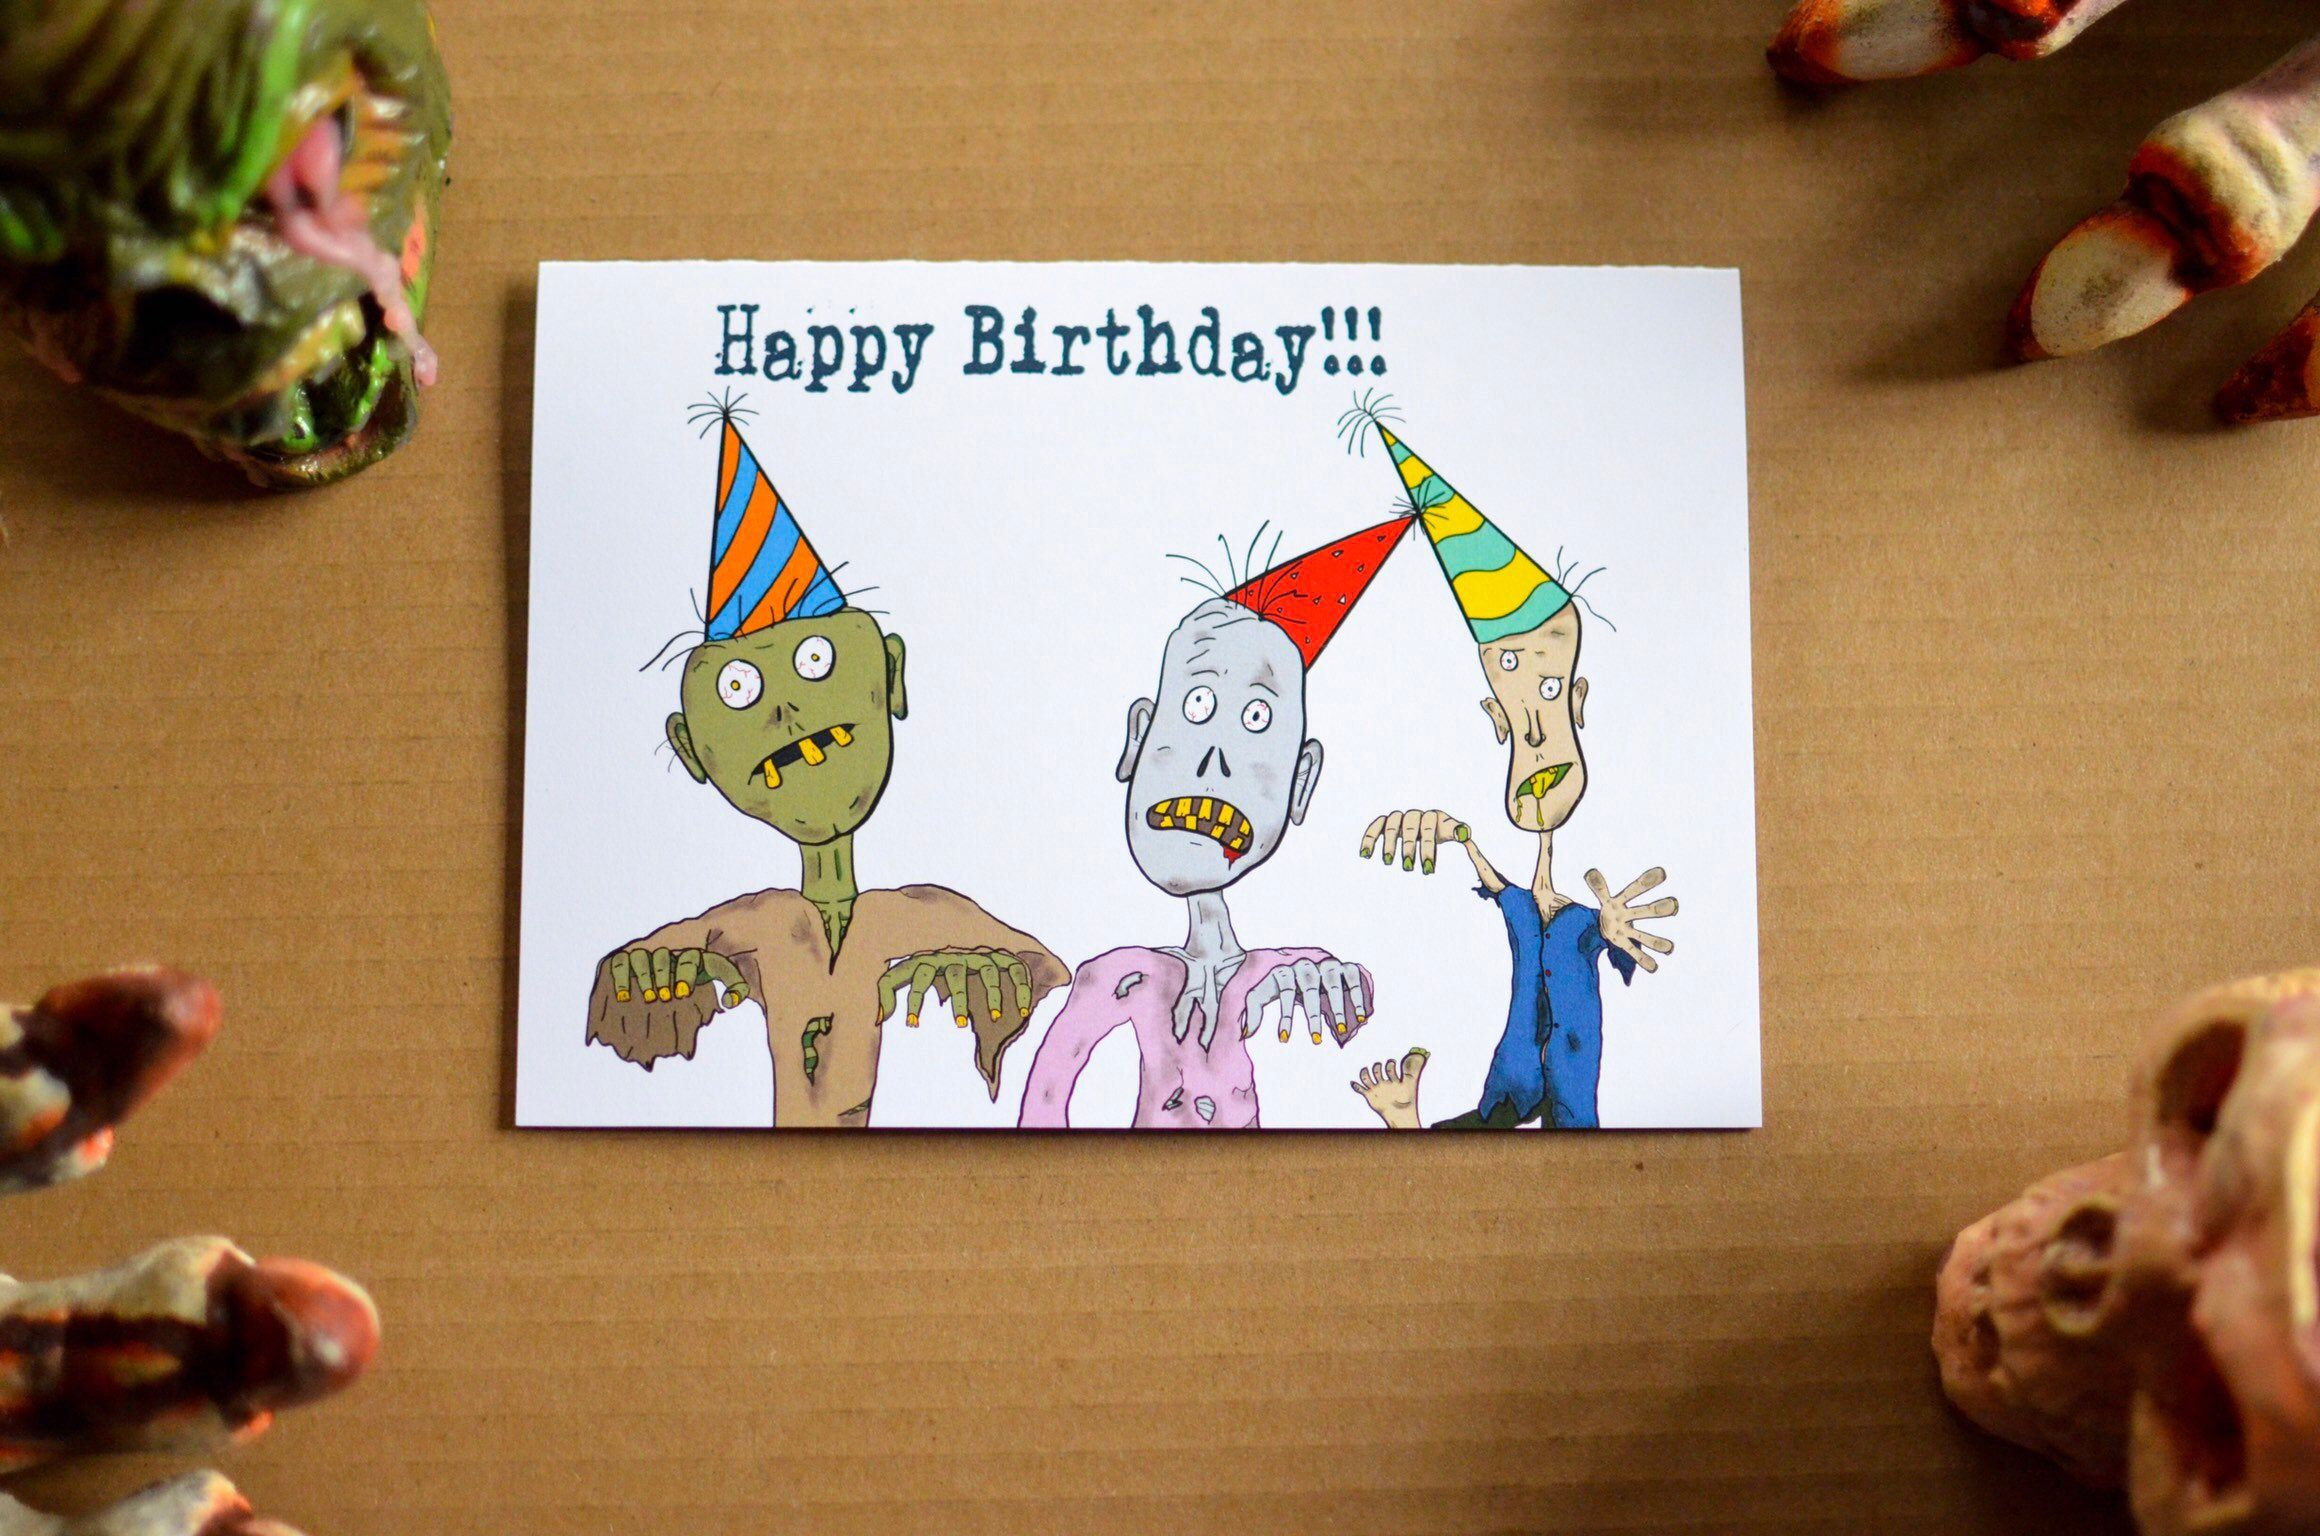 Zombie Birthday Card Funny Birthday Cards Zombie Cards Fun Birthday Cards Pun Birthday Card Boxed Zombie Birthday Funny Birthday Cards Birthday Cards